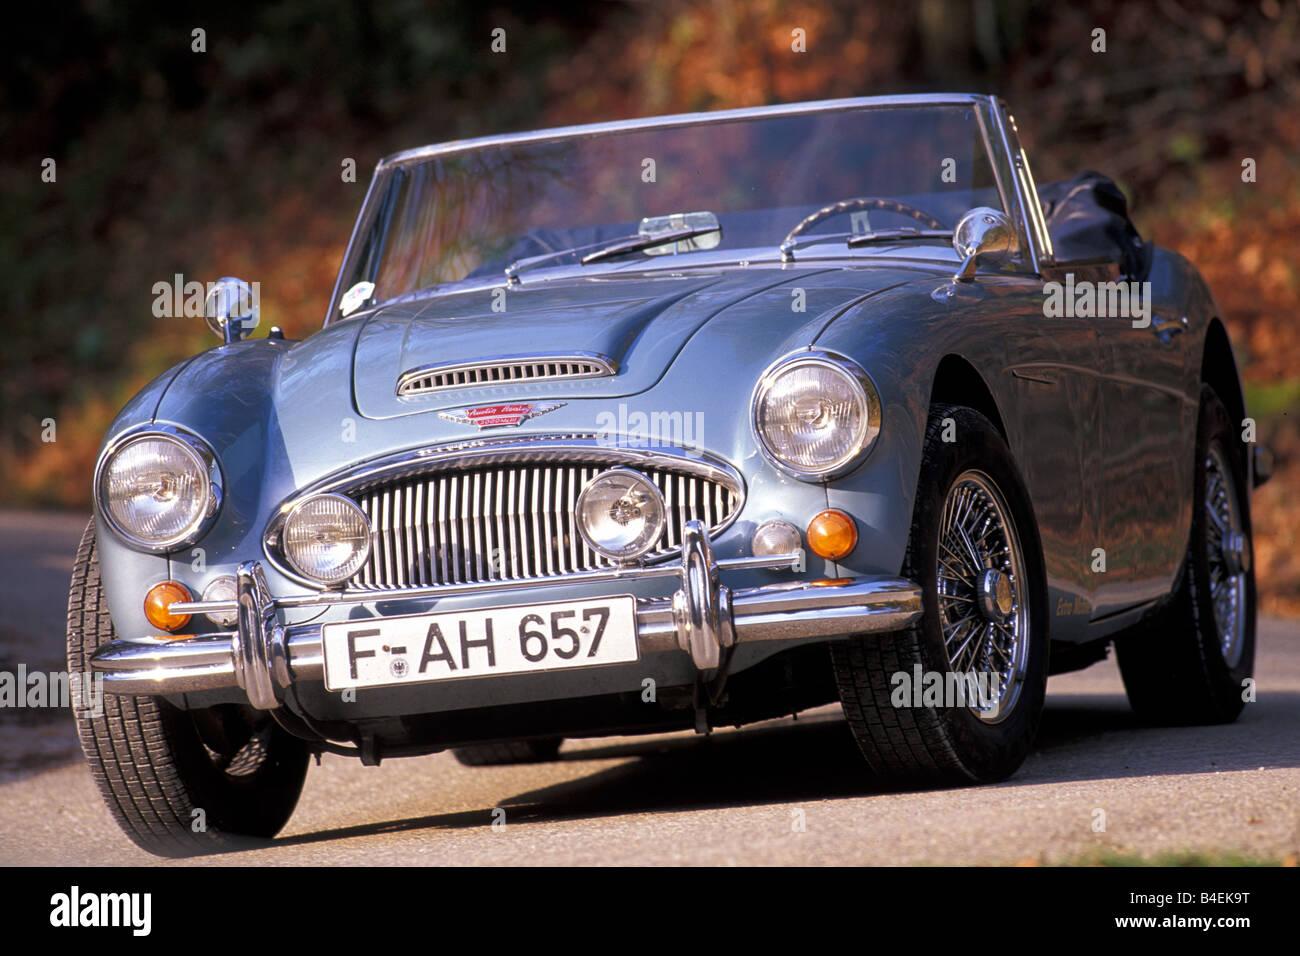 Car Austin Healey 3000 Mk Iii Convertible Vintage Car Model